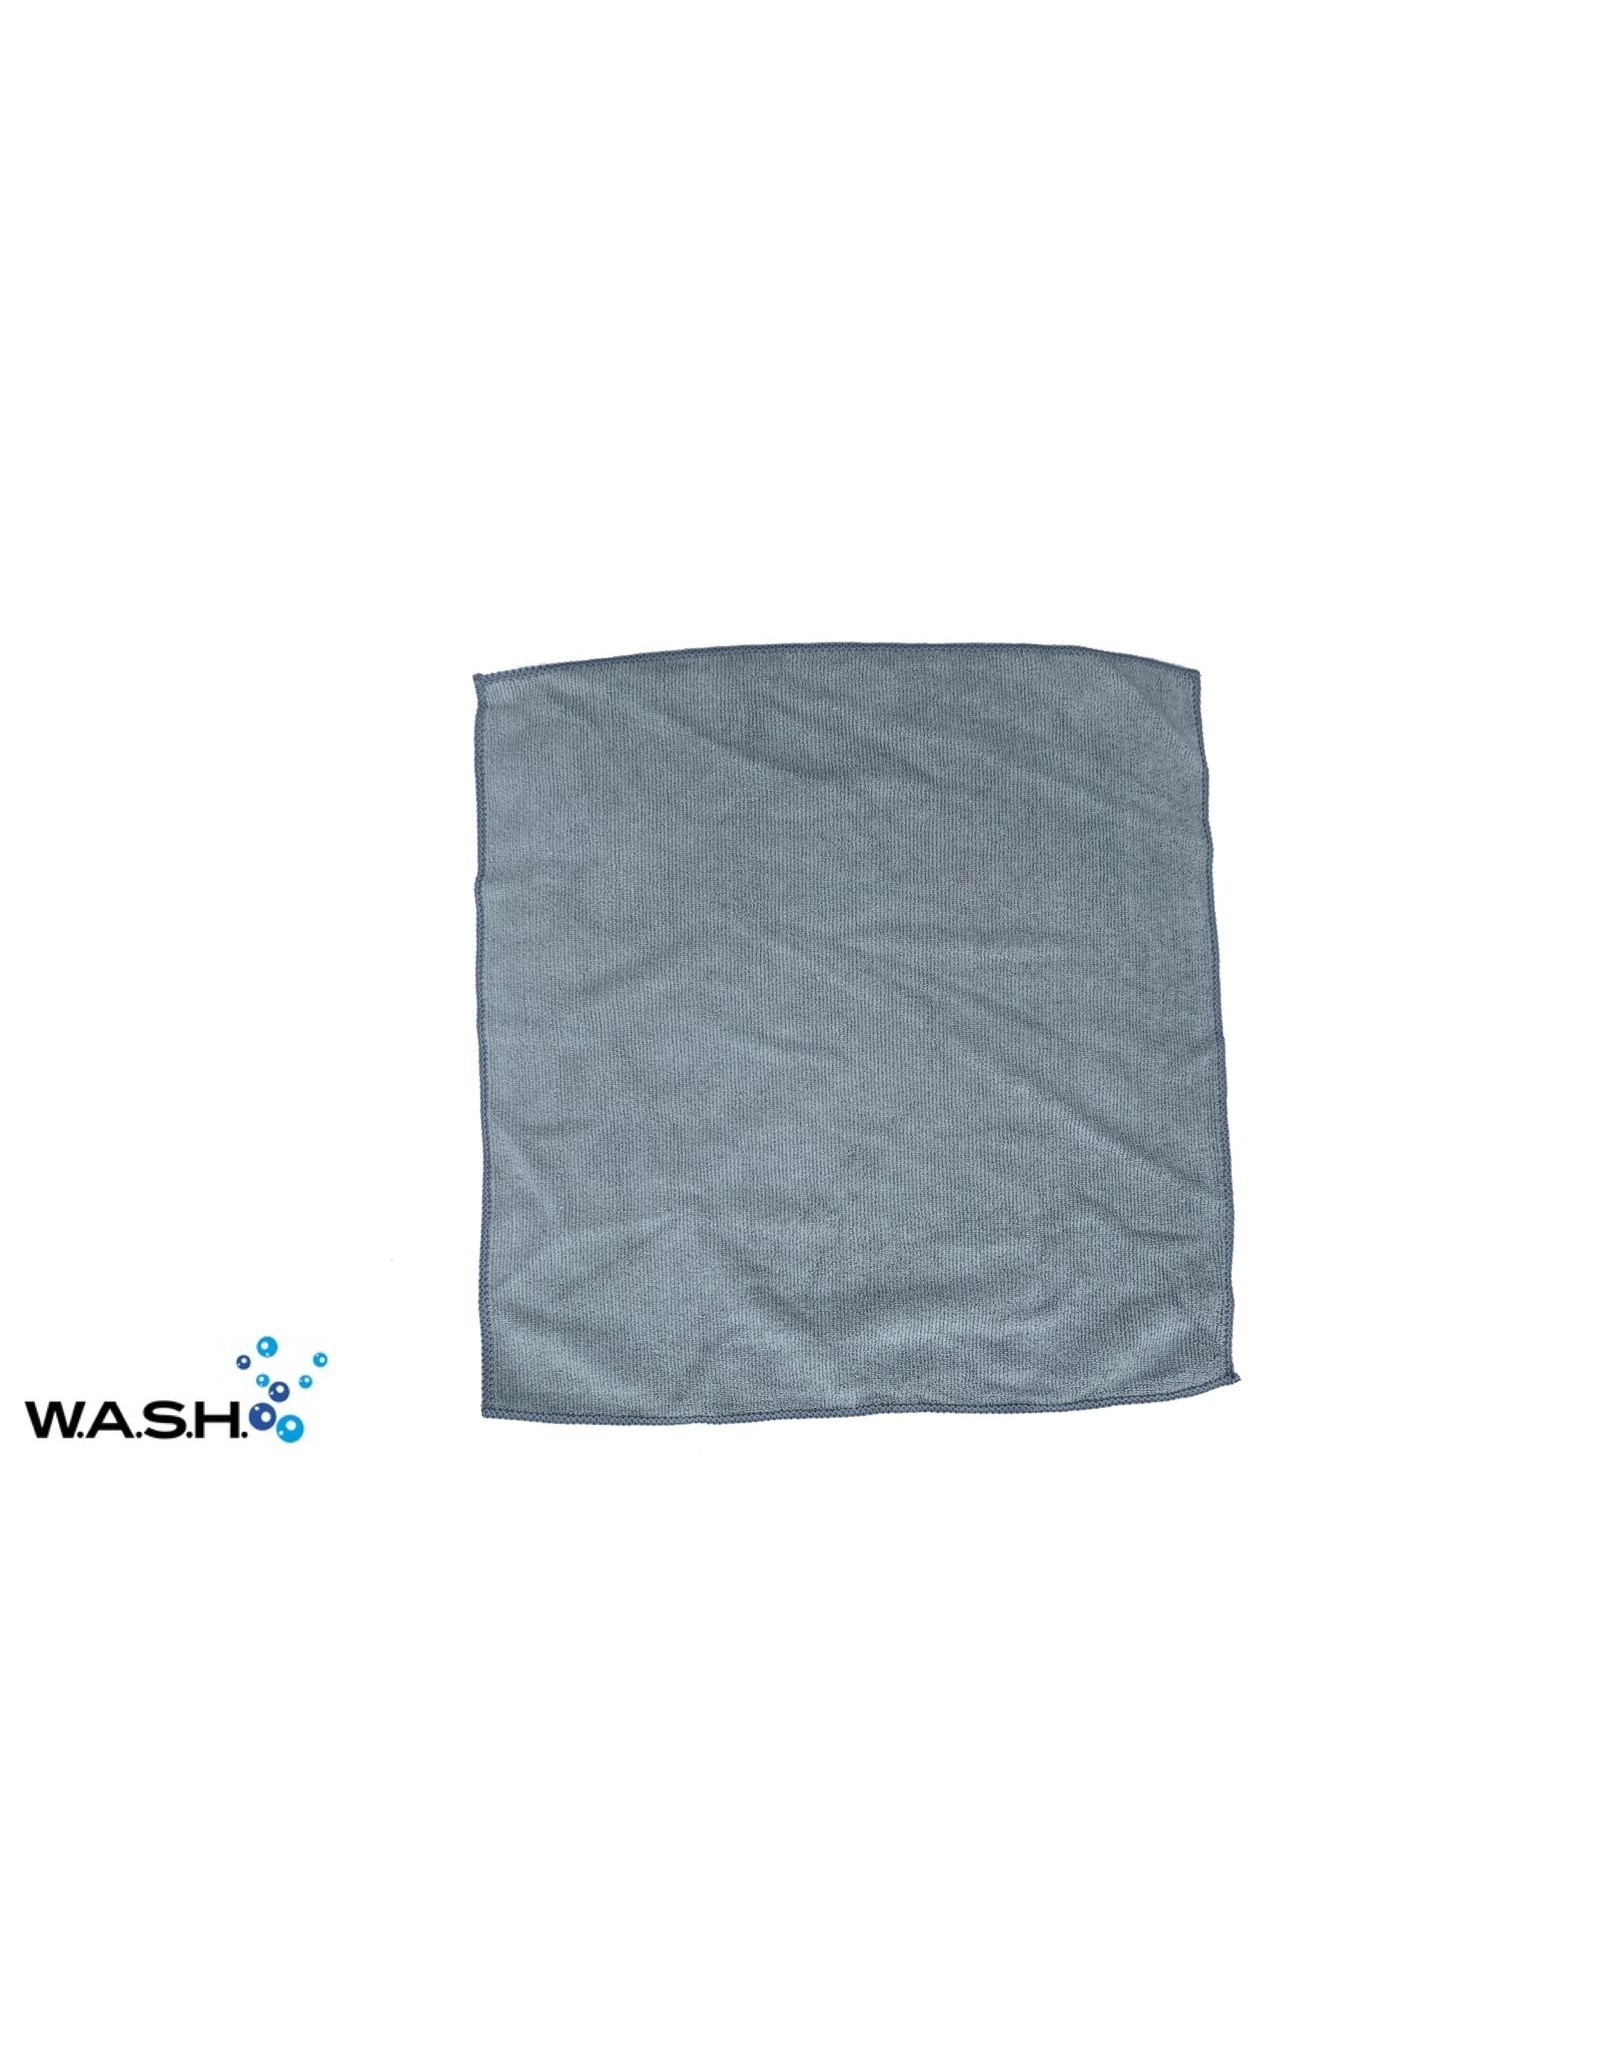 W.A.S.H. W.A.S.H. POETSDOEK Microfiber Stof Grijs 40x40 cm - 1 stuk